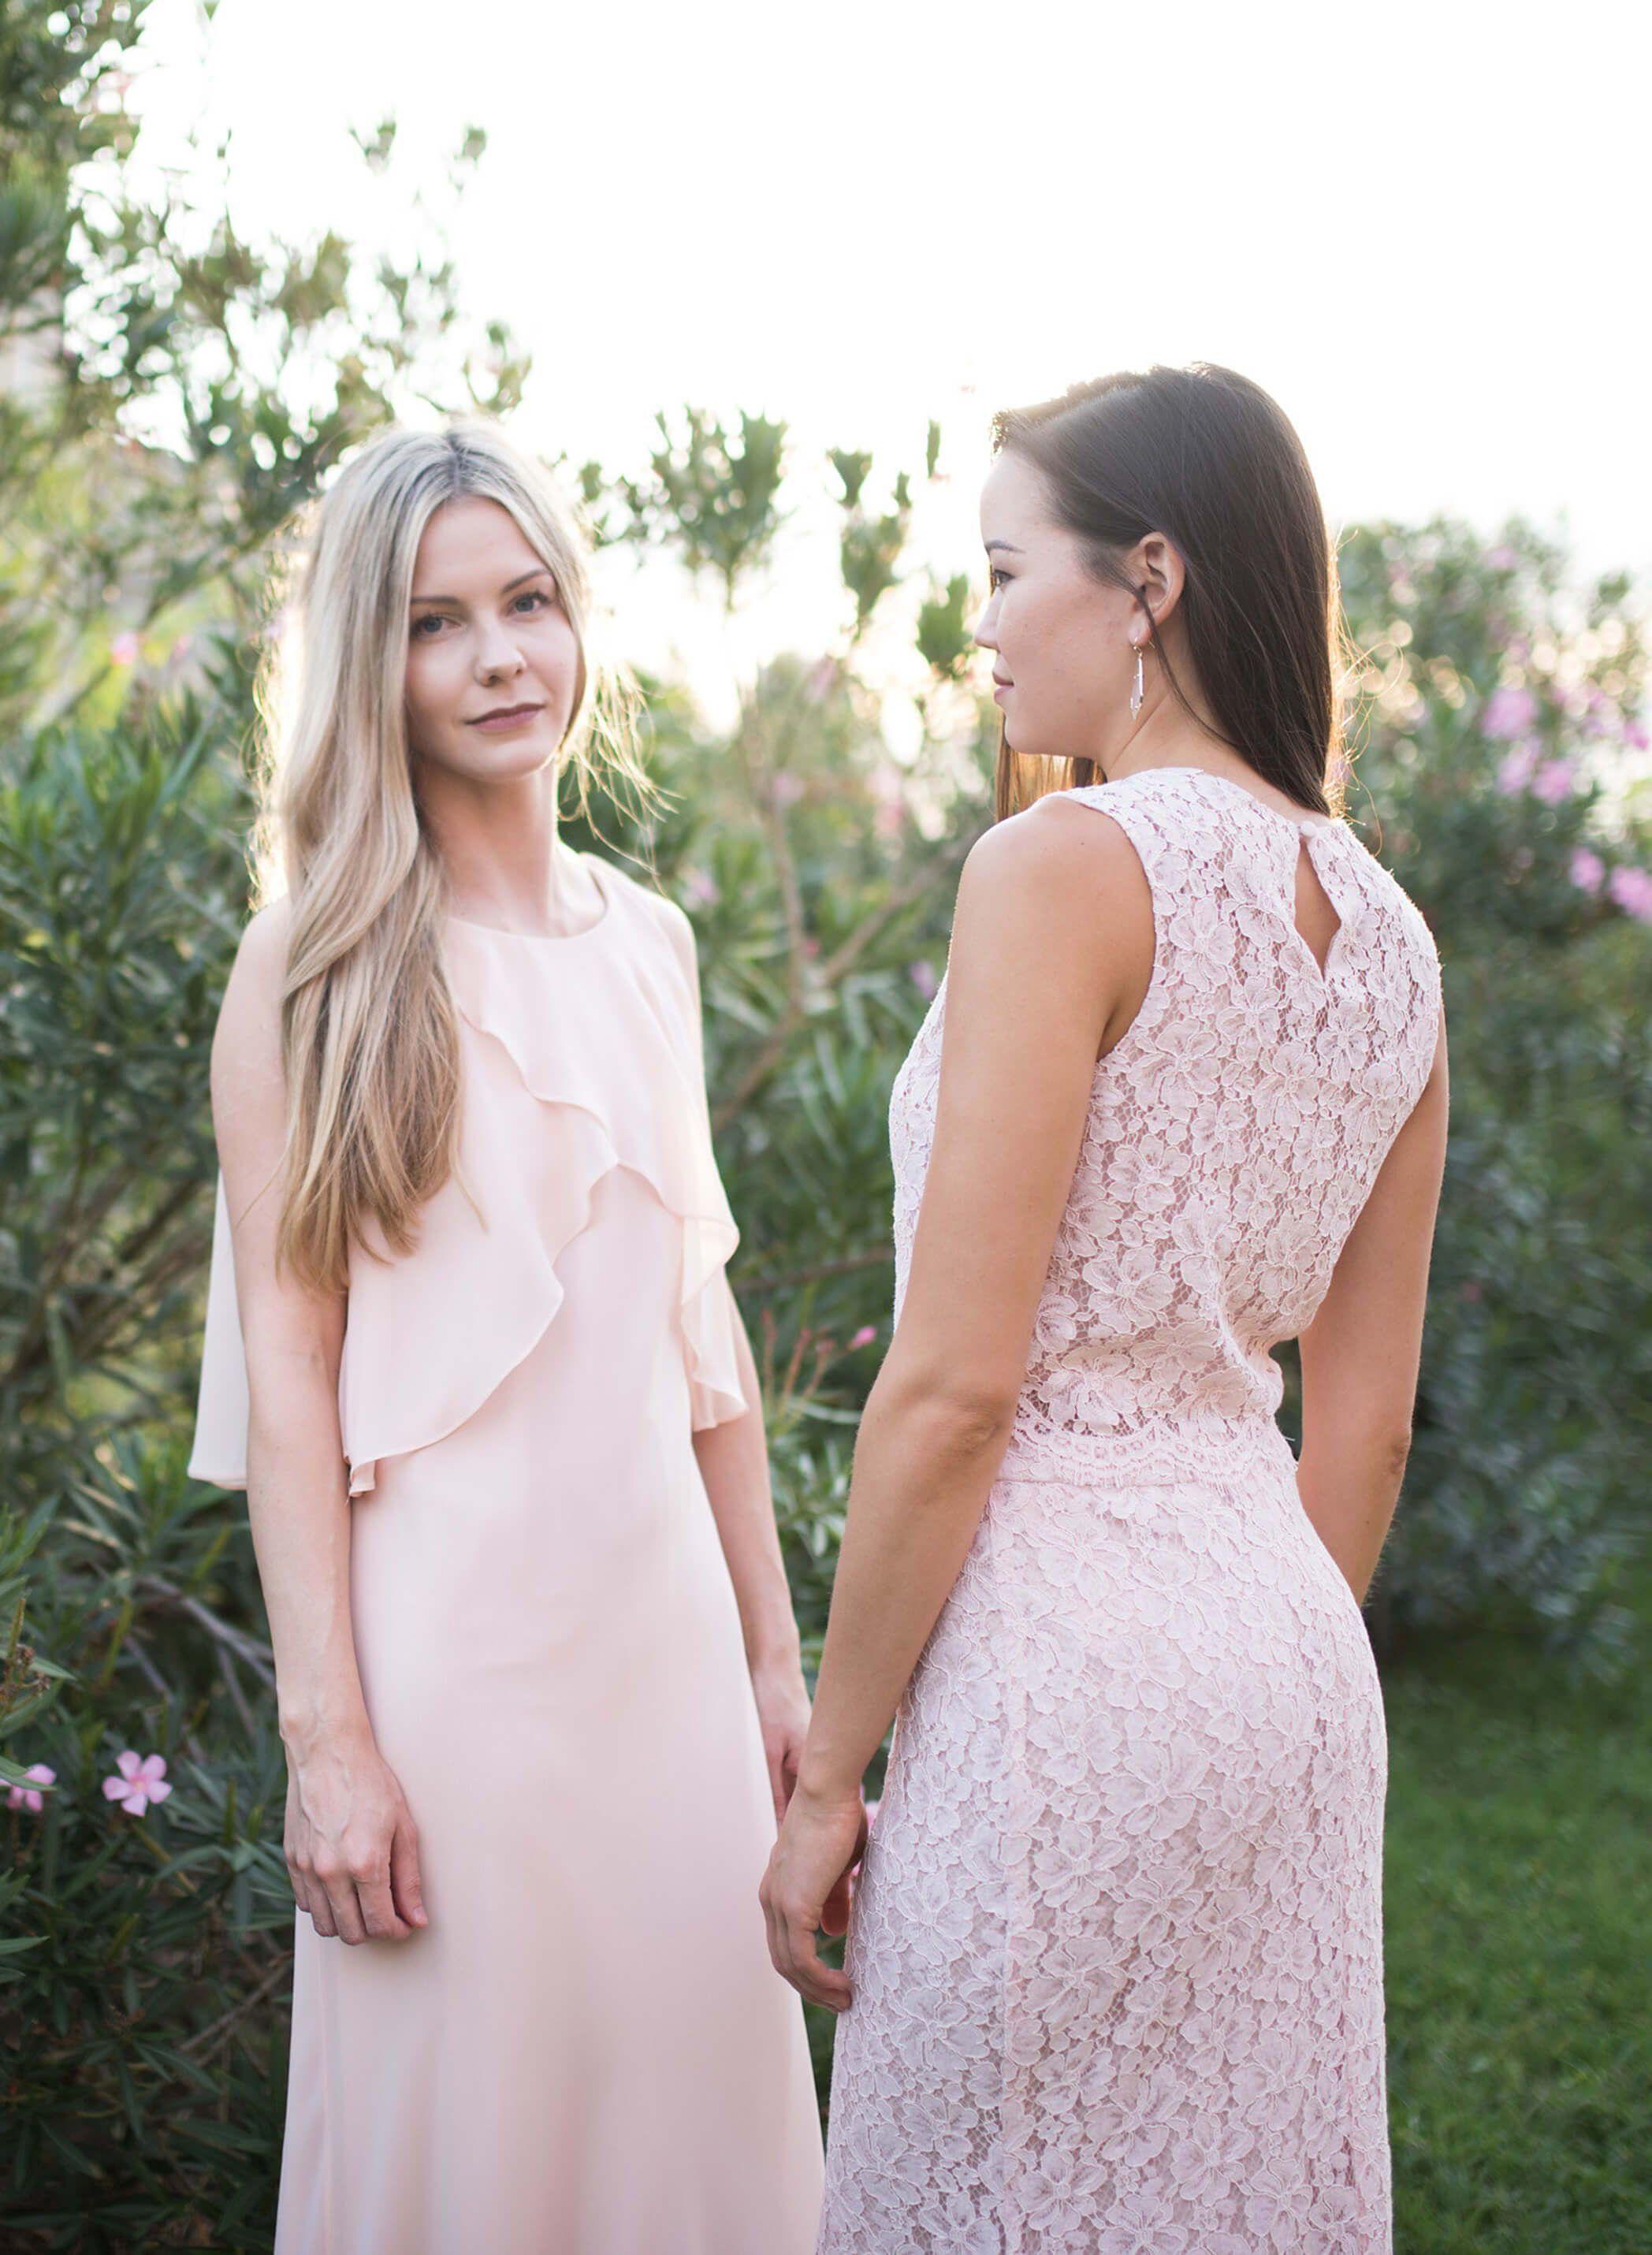 Alethea dress blushing bridesmaids pinterest long bridesmaid